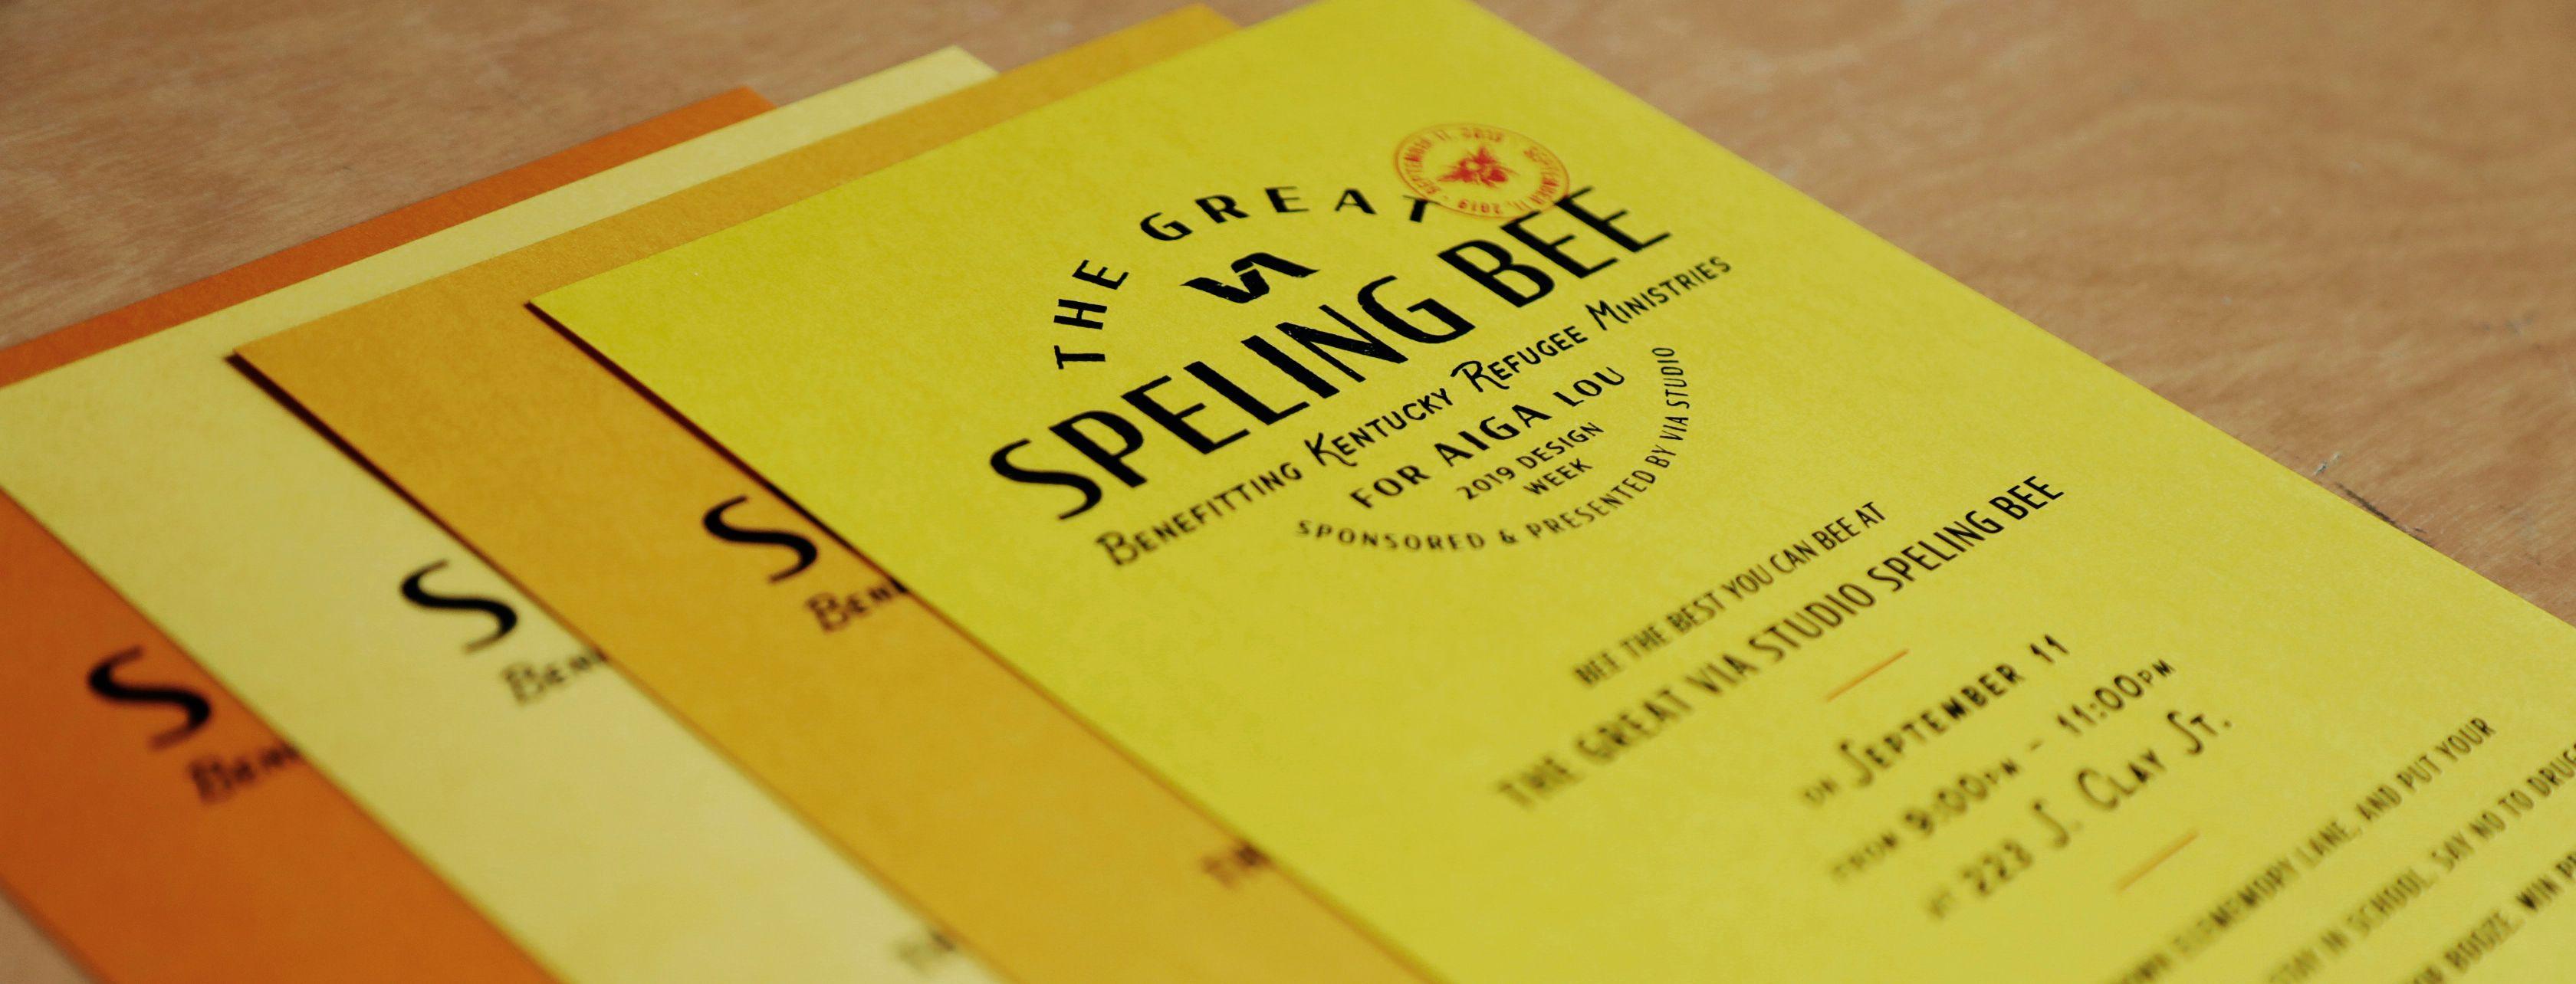 The Great VIA Speling Bee